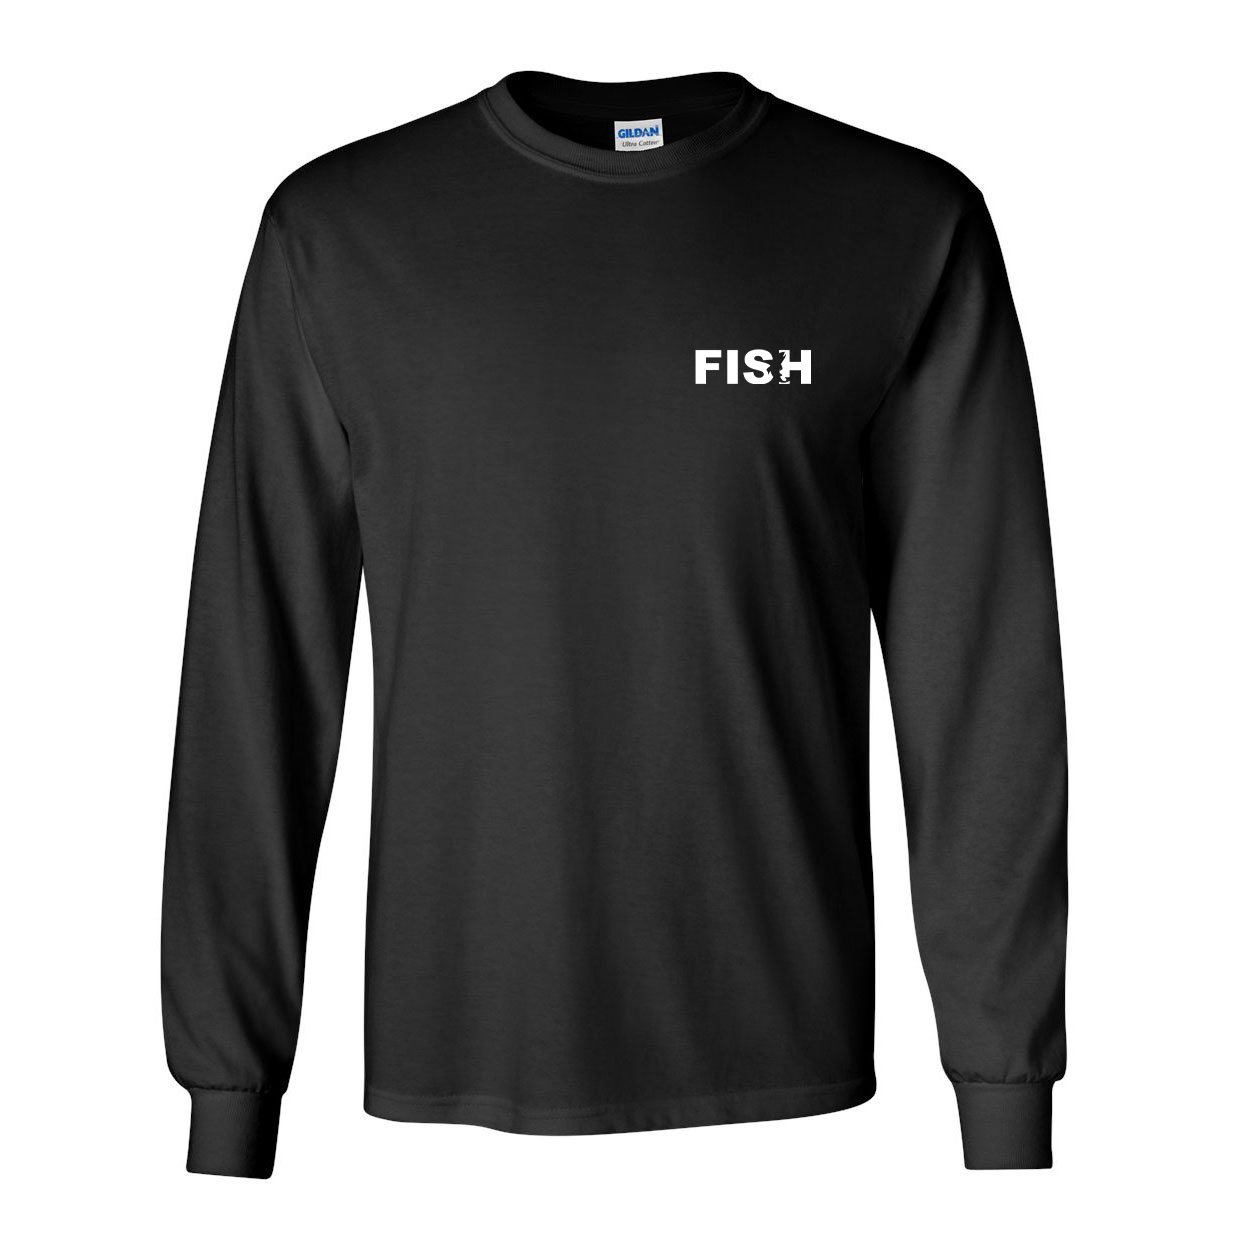 Fish Catch Logo Night Out Long Sleeve T-Shirt Black (White Logo)